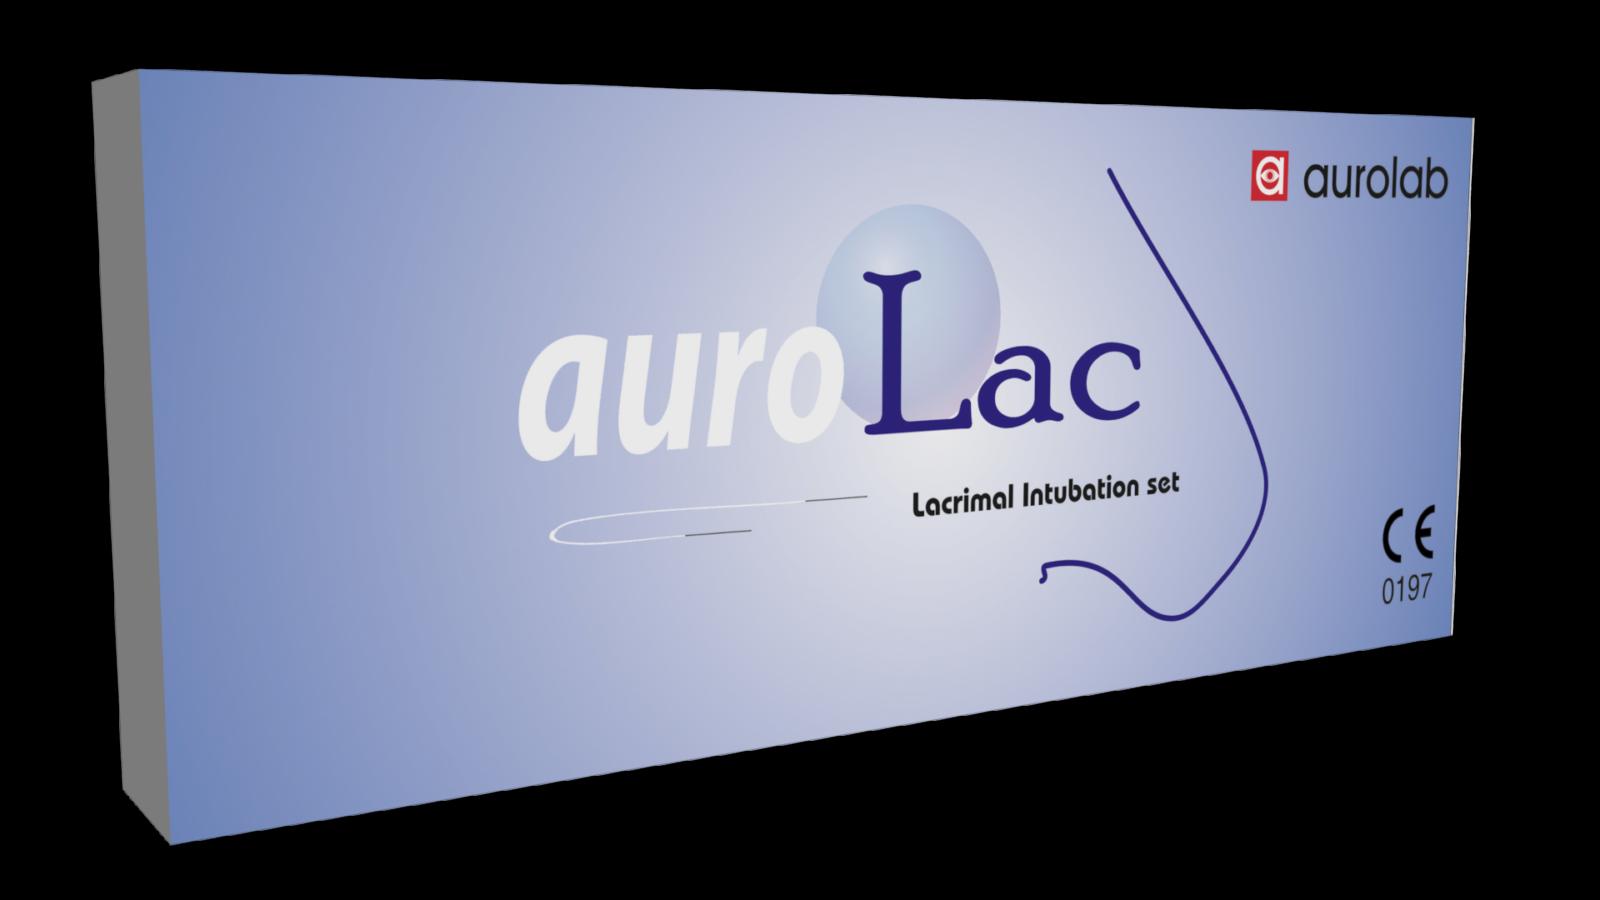 Aurolac – Lacrimal intubation tube Model – L6032